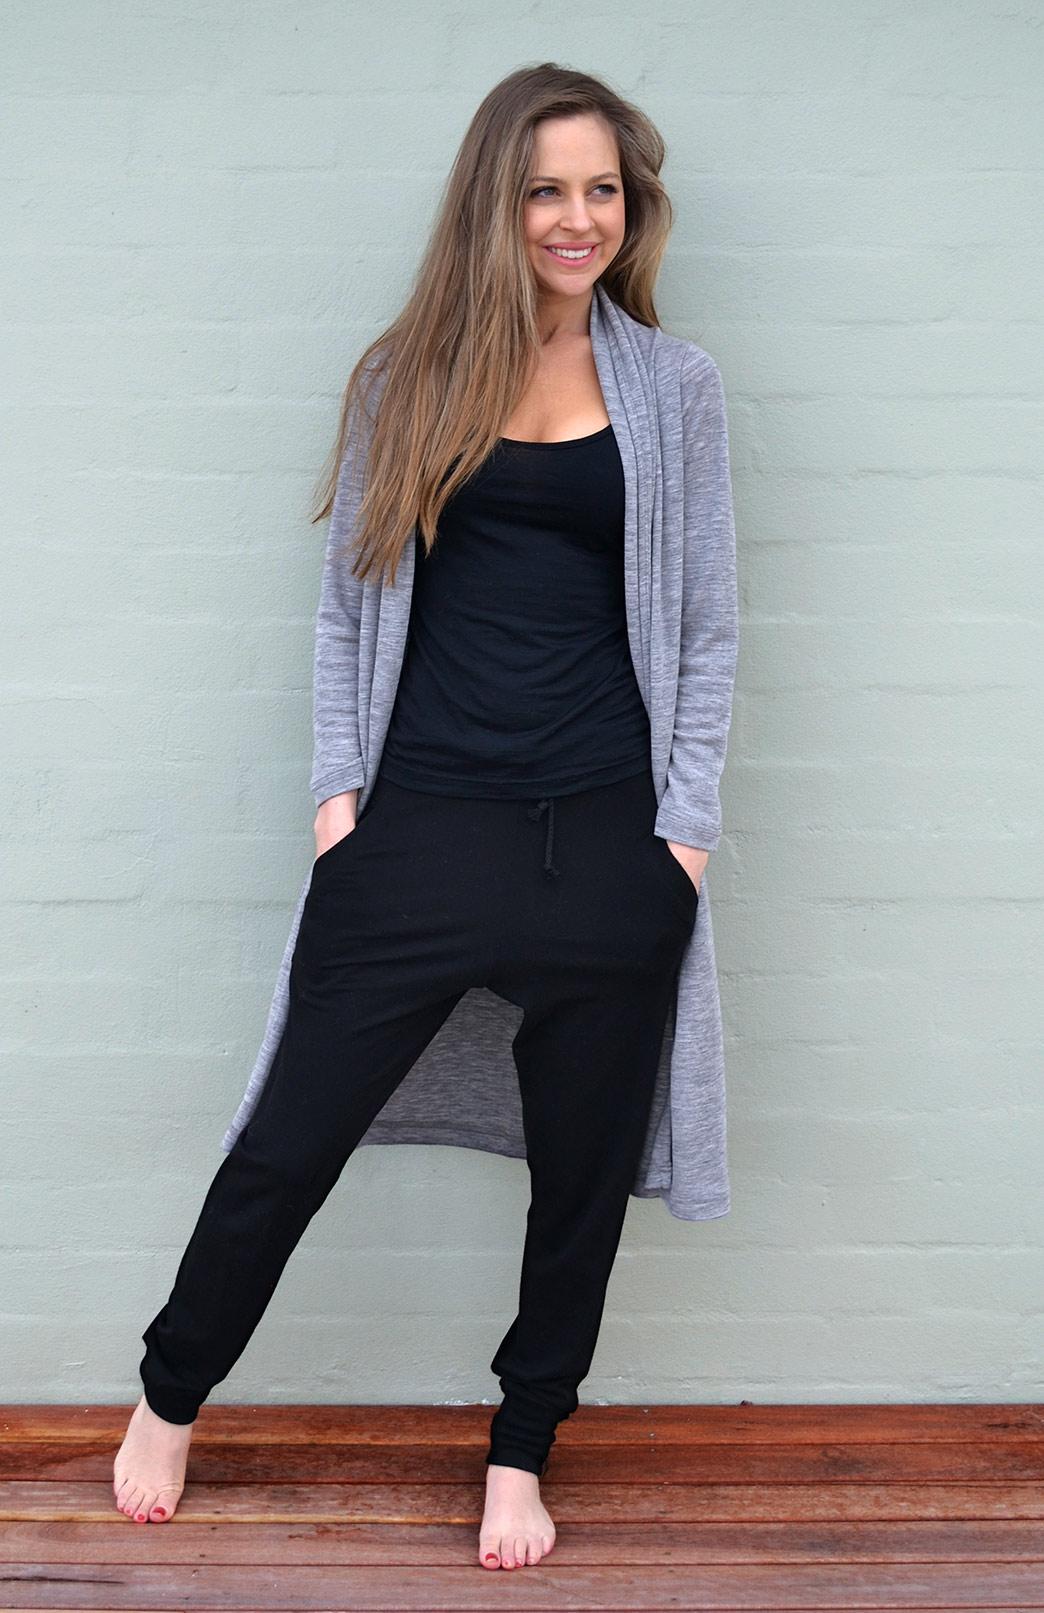 Lounge Pants - Women's Black Wool Jogger Pants with pockets and ties - Smitten Merino Tasmania Australia